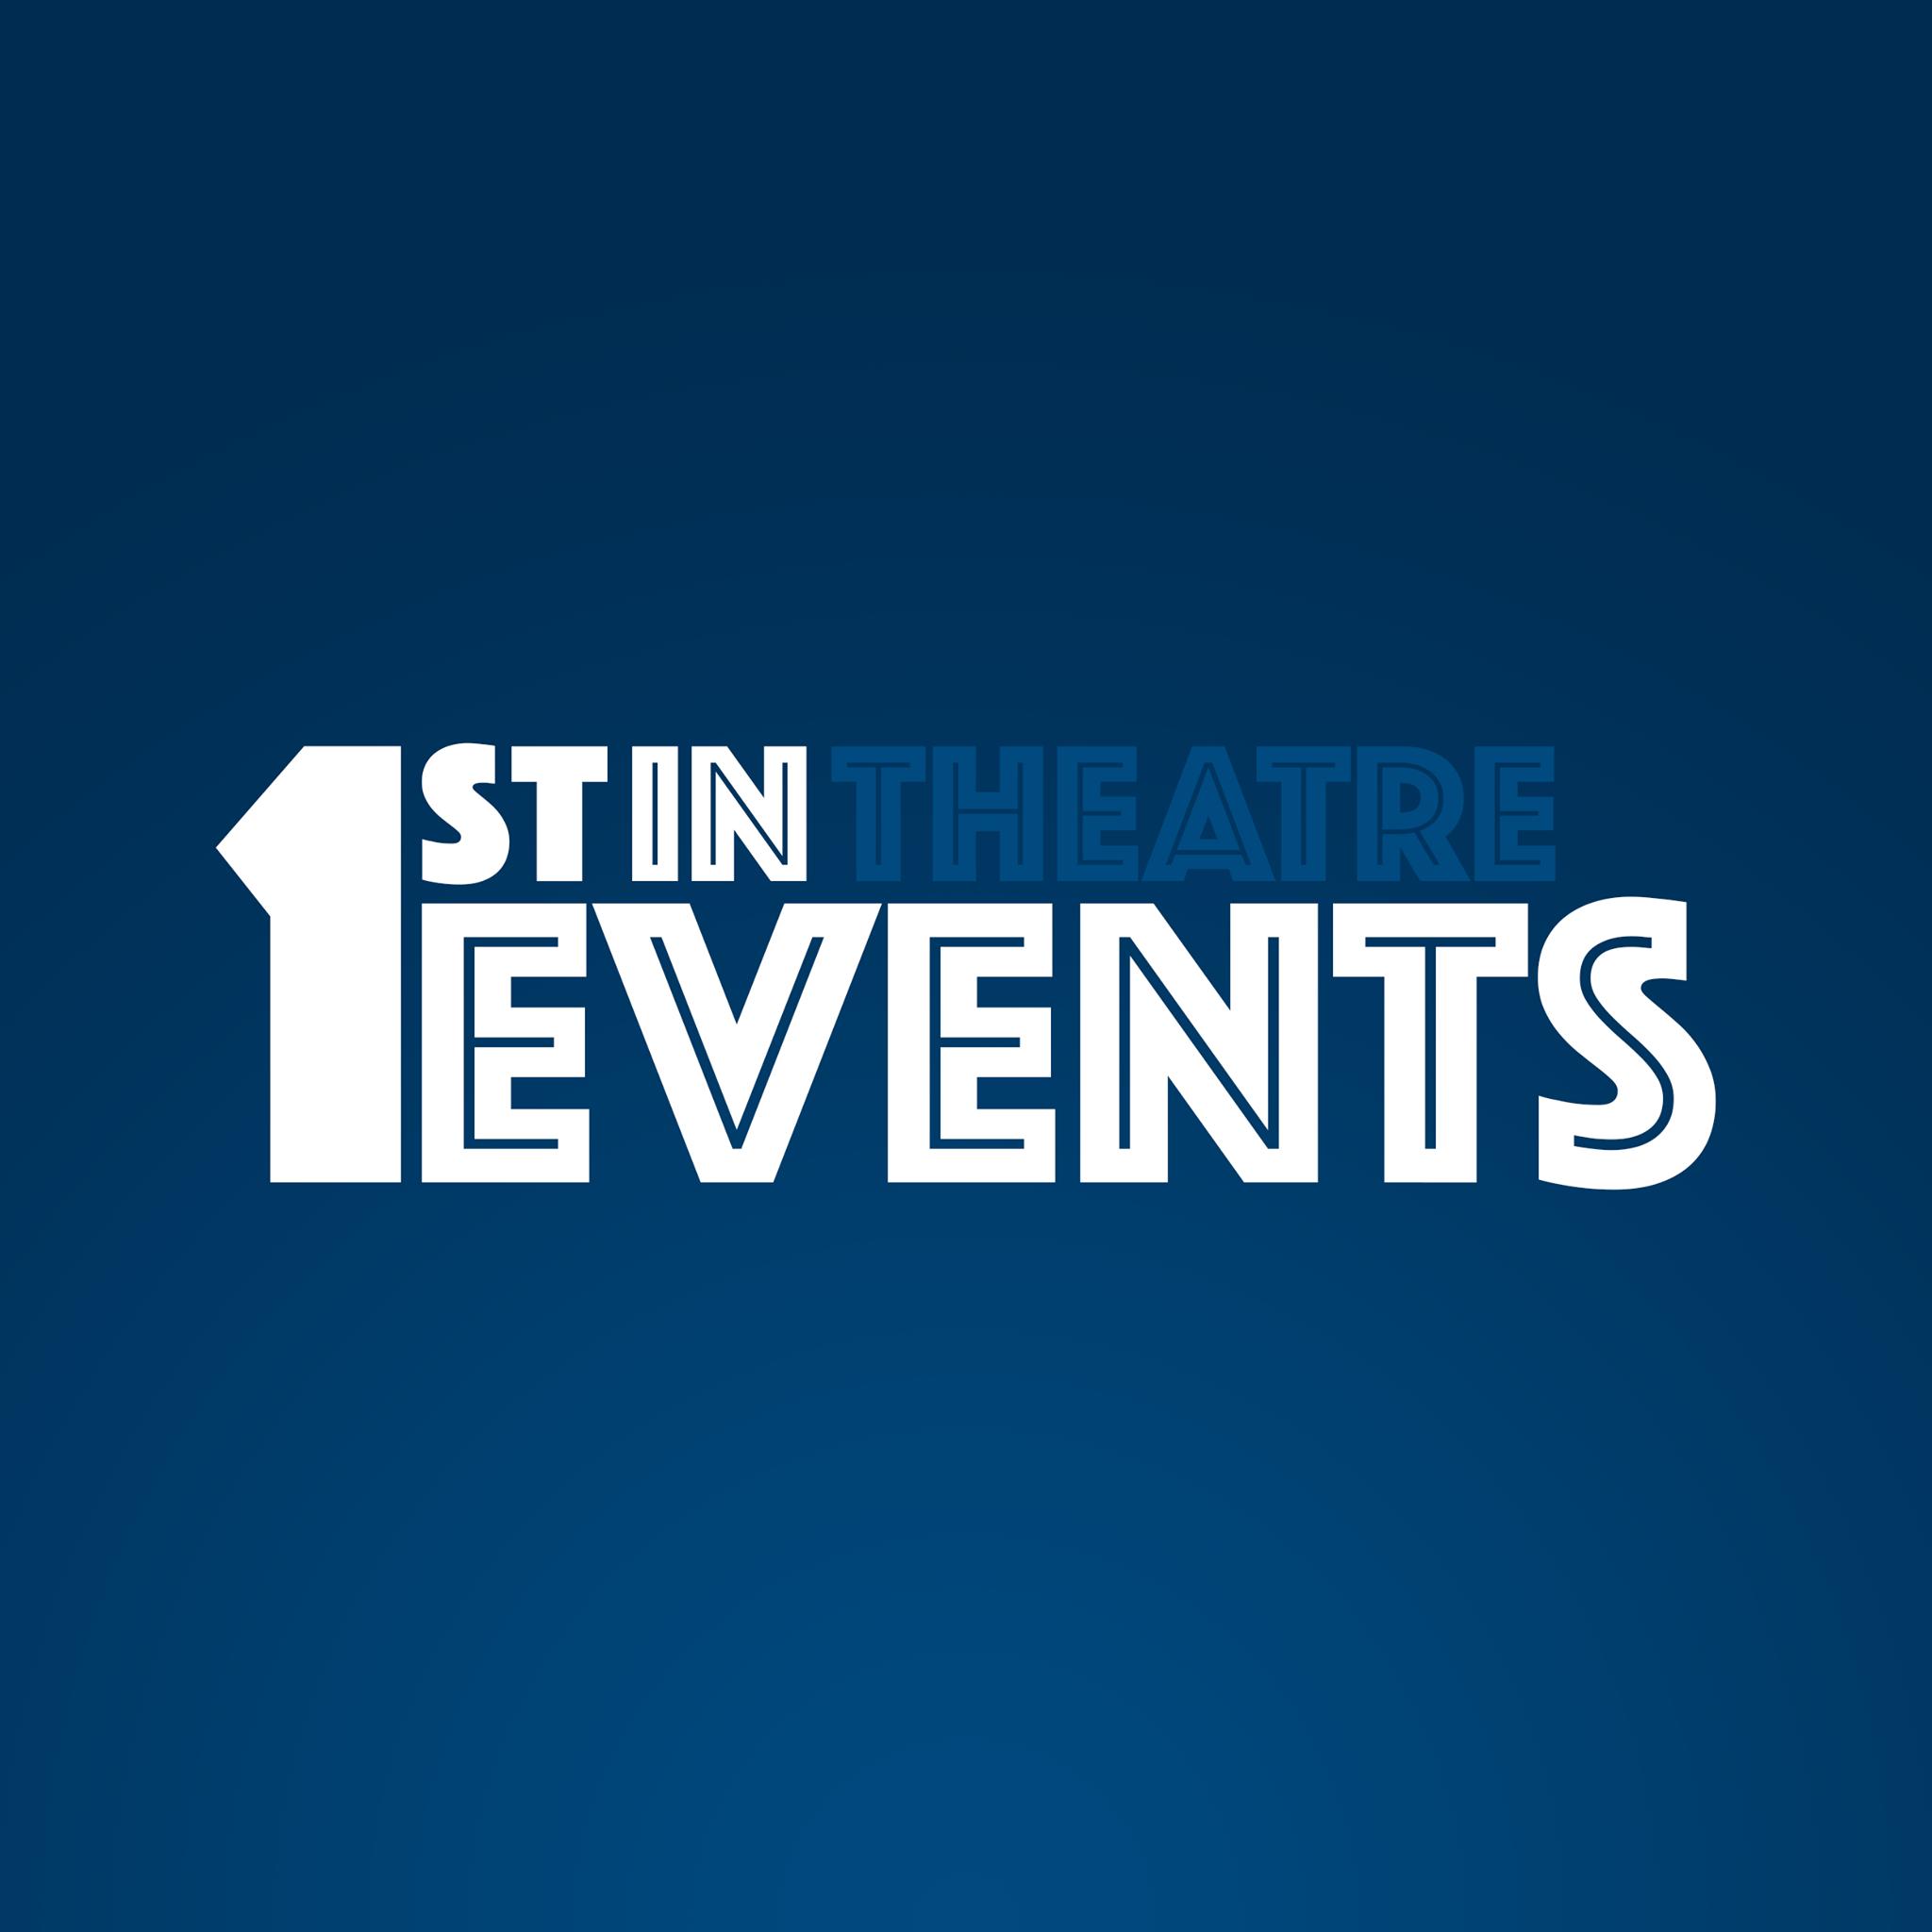 1stInTheatre Logo No Background.png